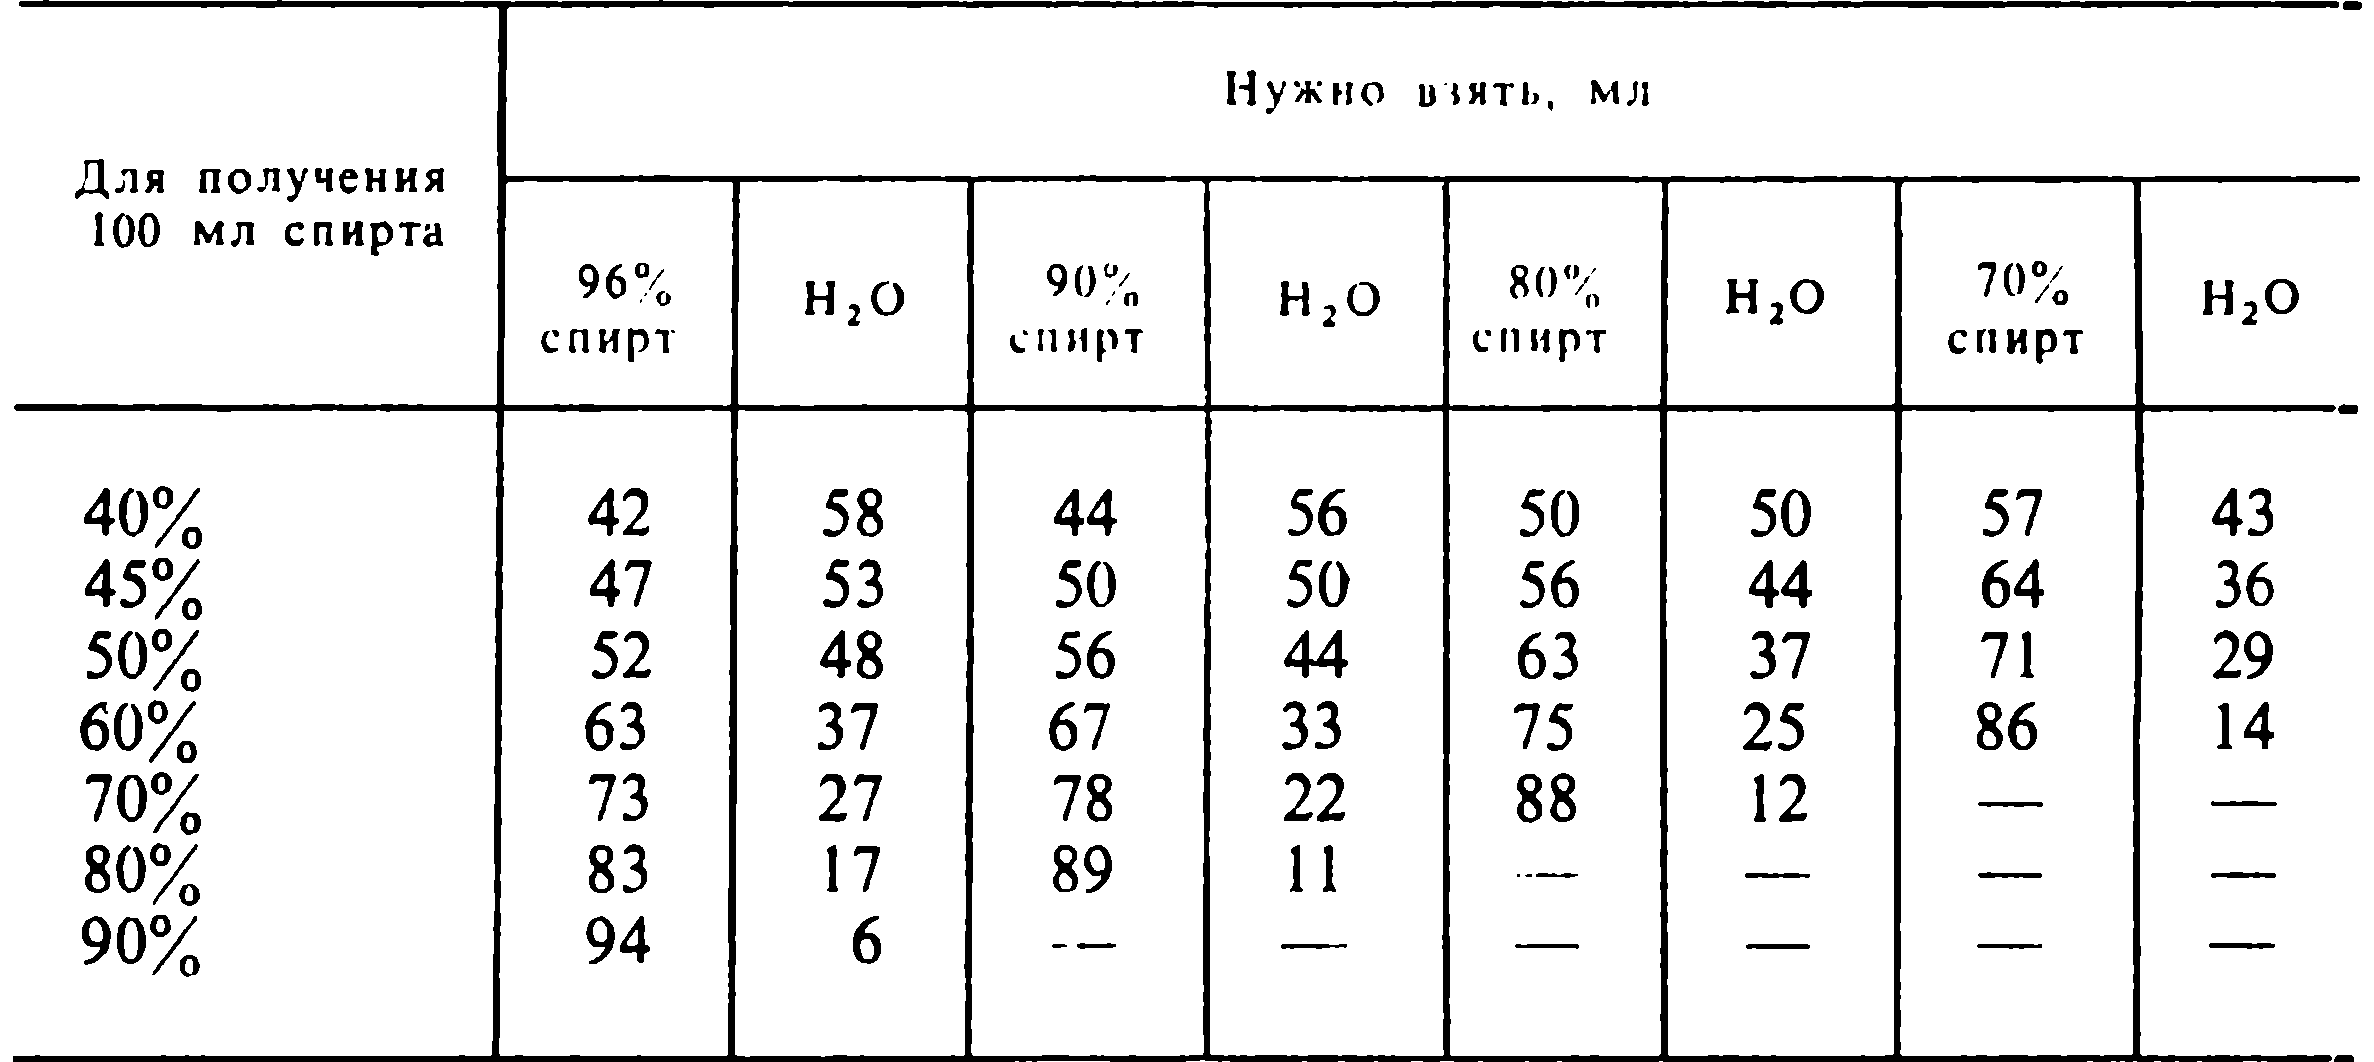 Как правильно развести спирт, формула, пример, калькулятор самогонщика онлайн